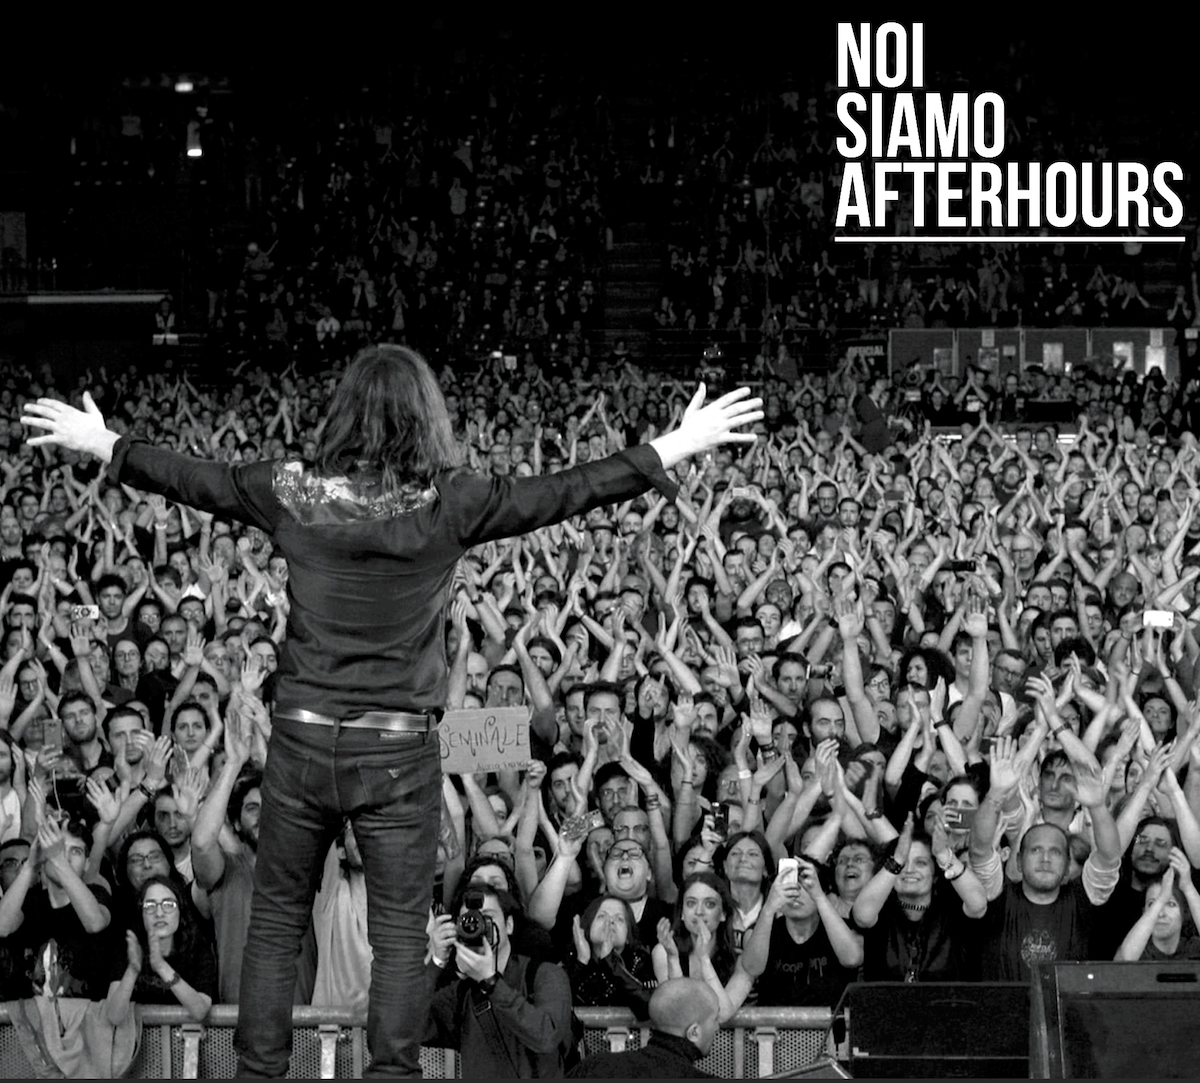 Noi Siamo Afterhours - Afterhours